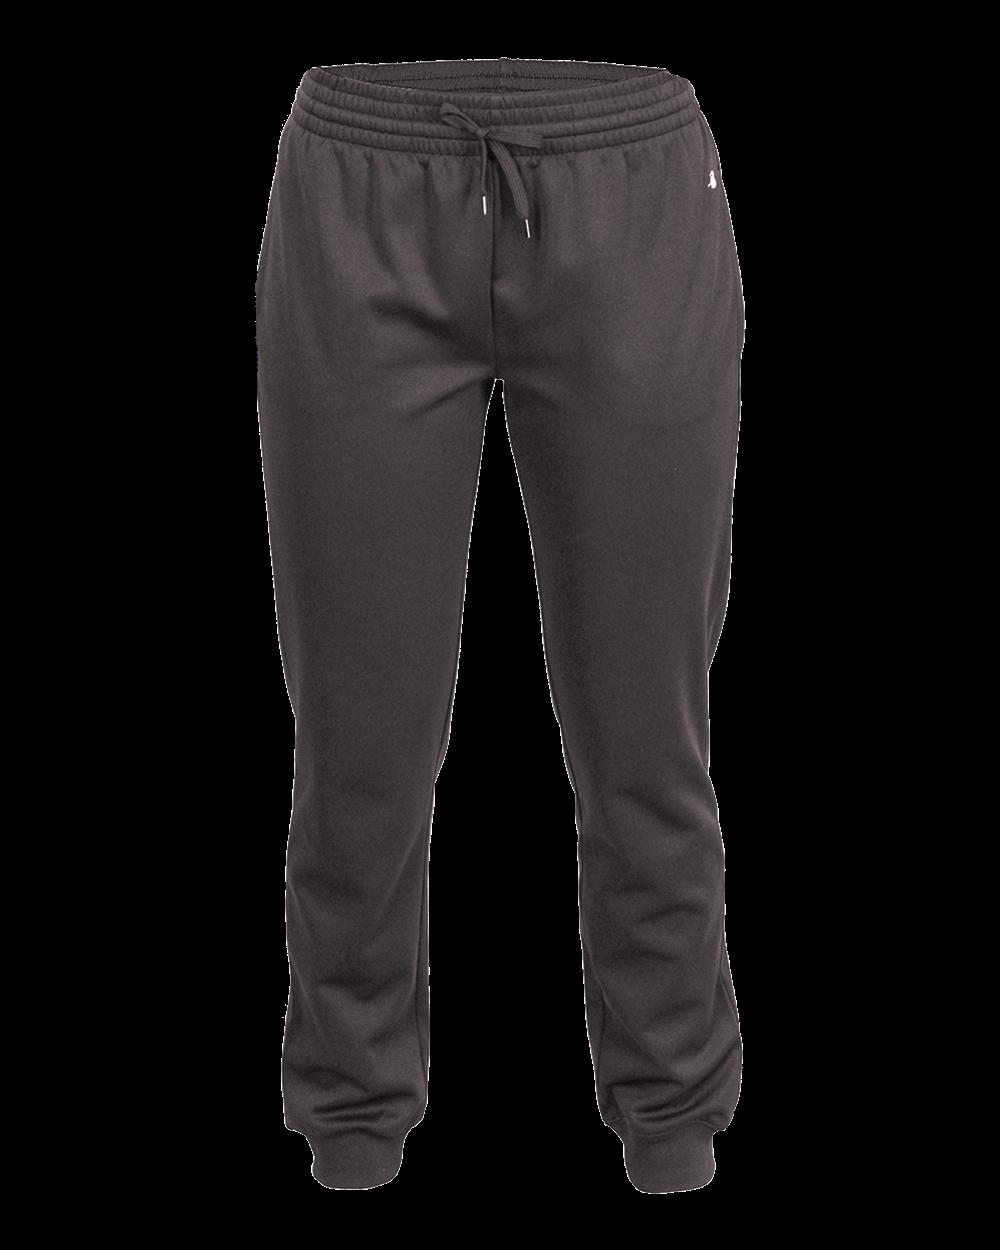 Jogger Women's Pant - Graphite